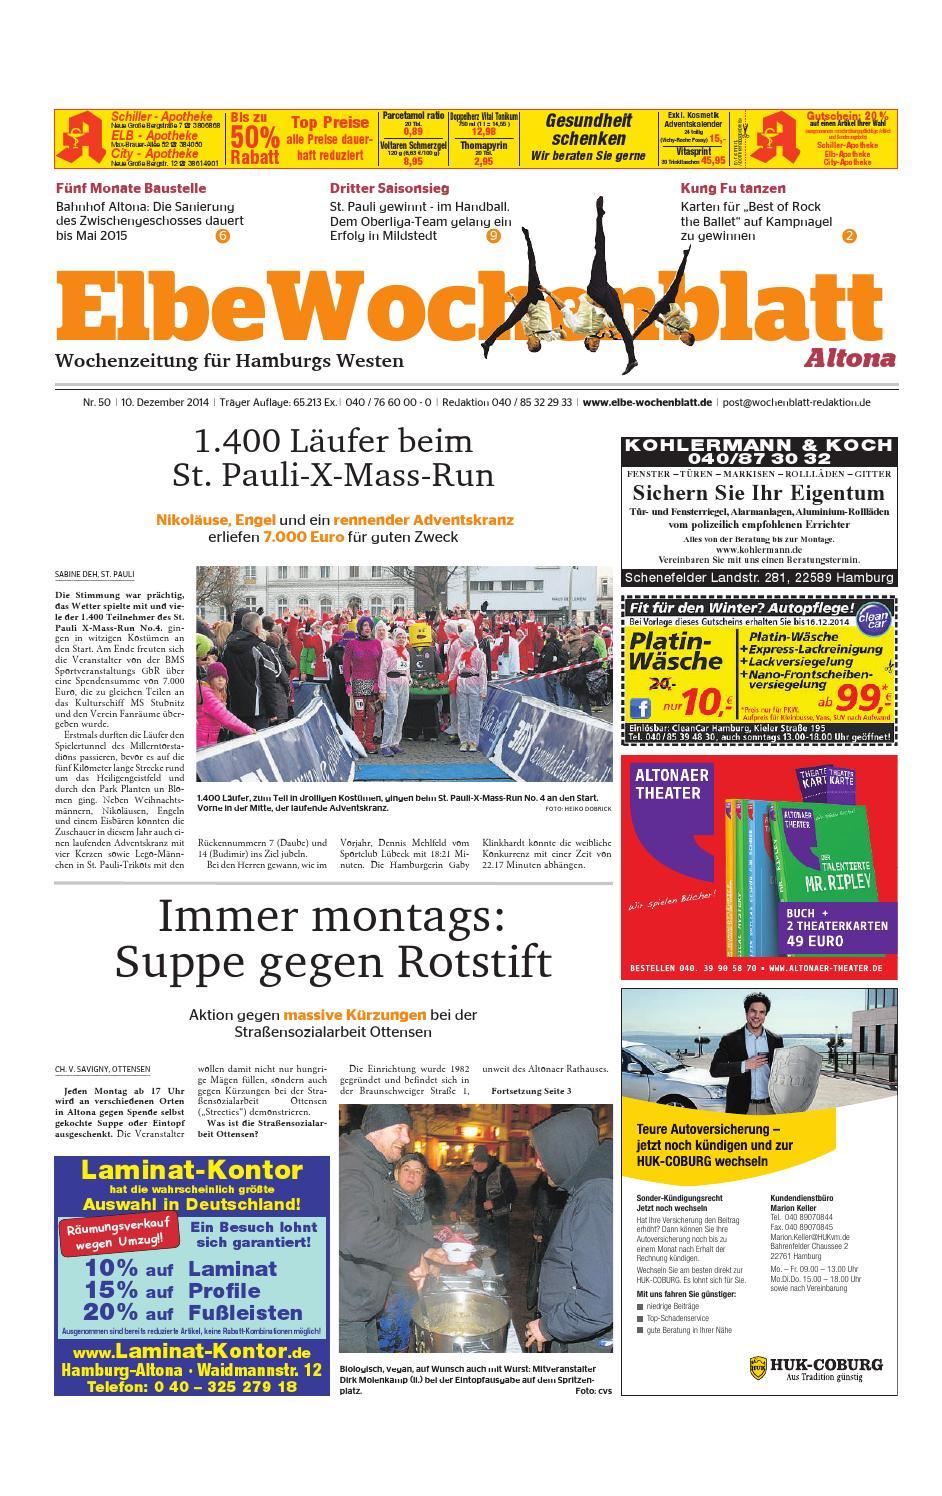 Altona KW50-2014 by Elbe Wochenblatt Verlagsgesellschaft mbH & Co.KG - issuu